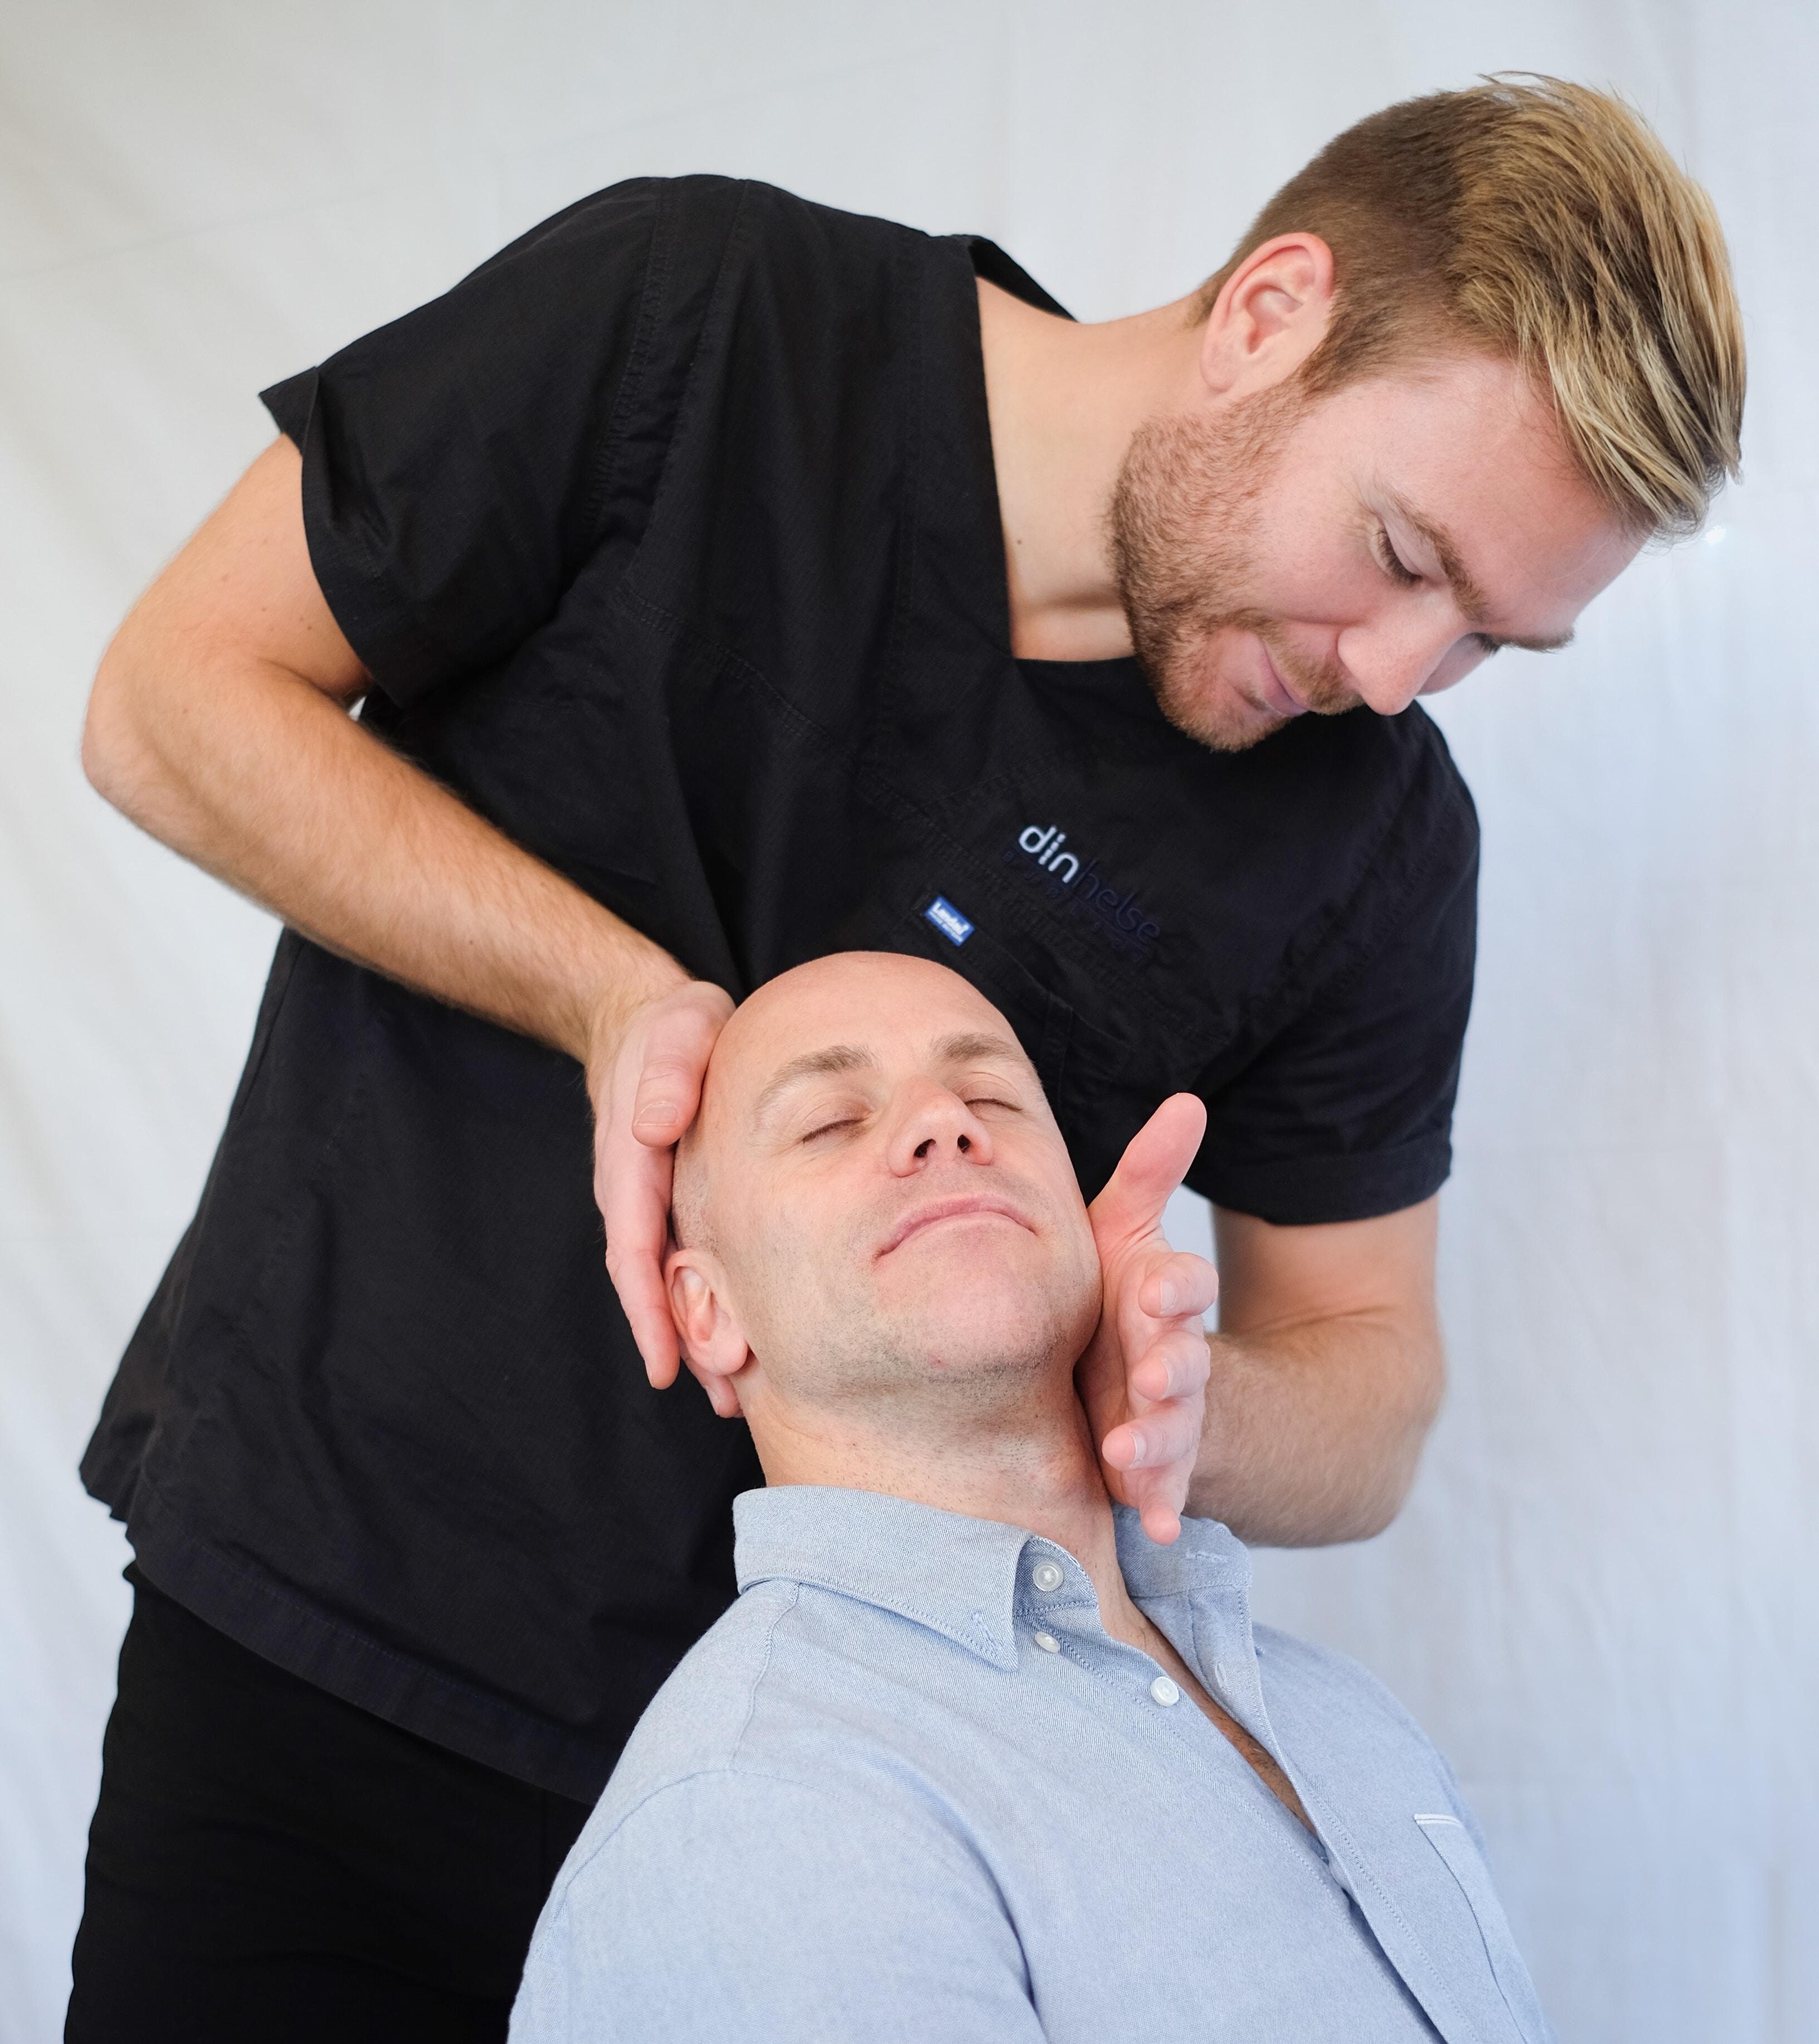 man in black medical scrub top massaging man's neck